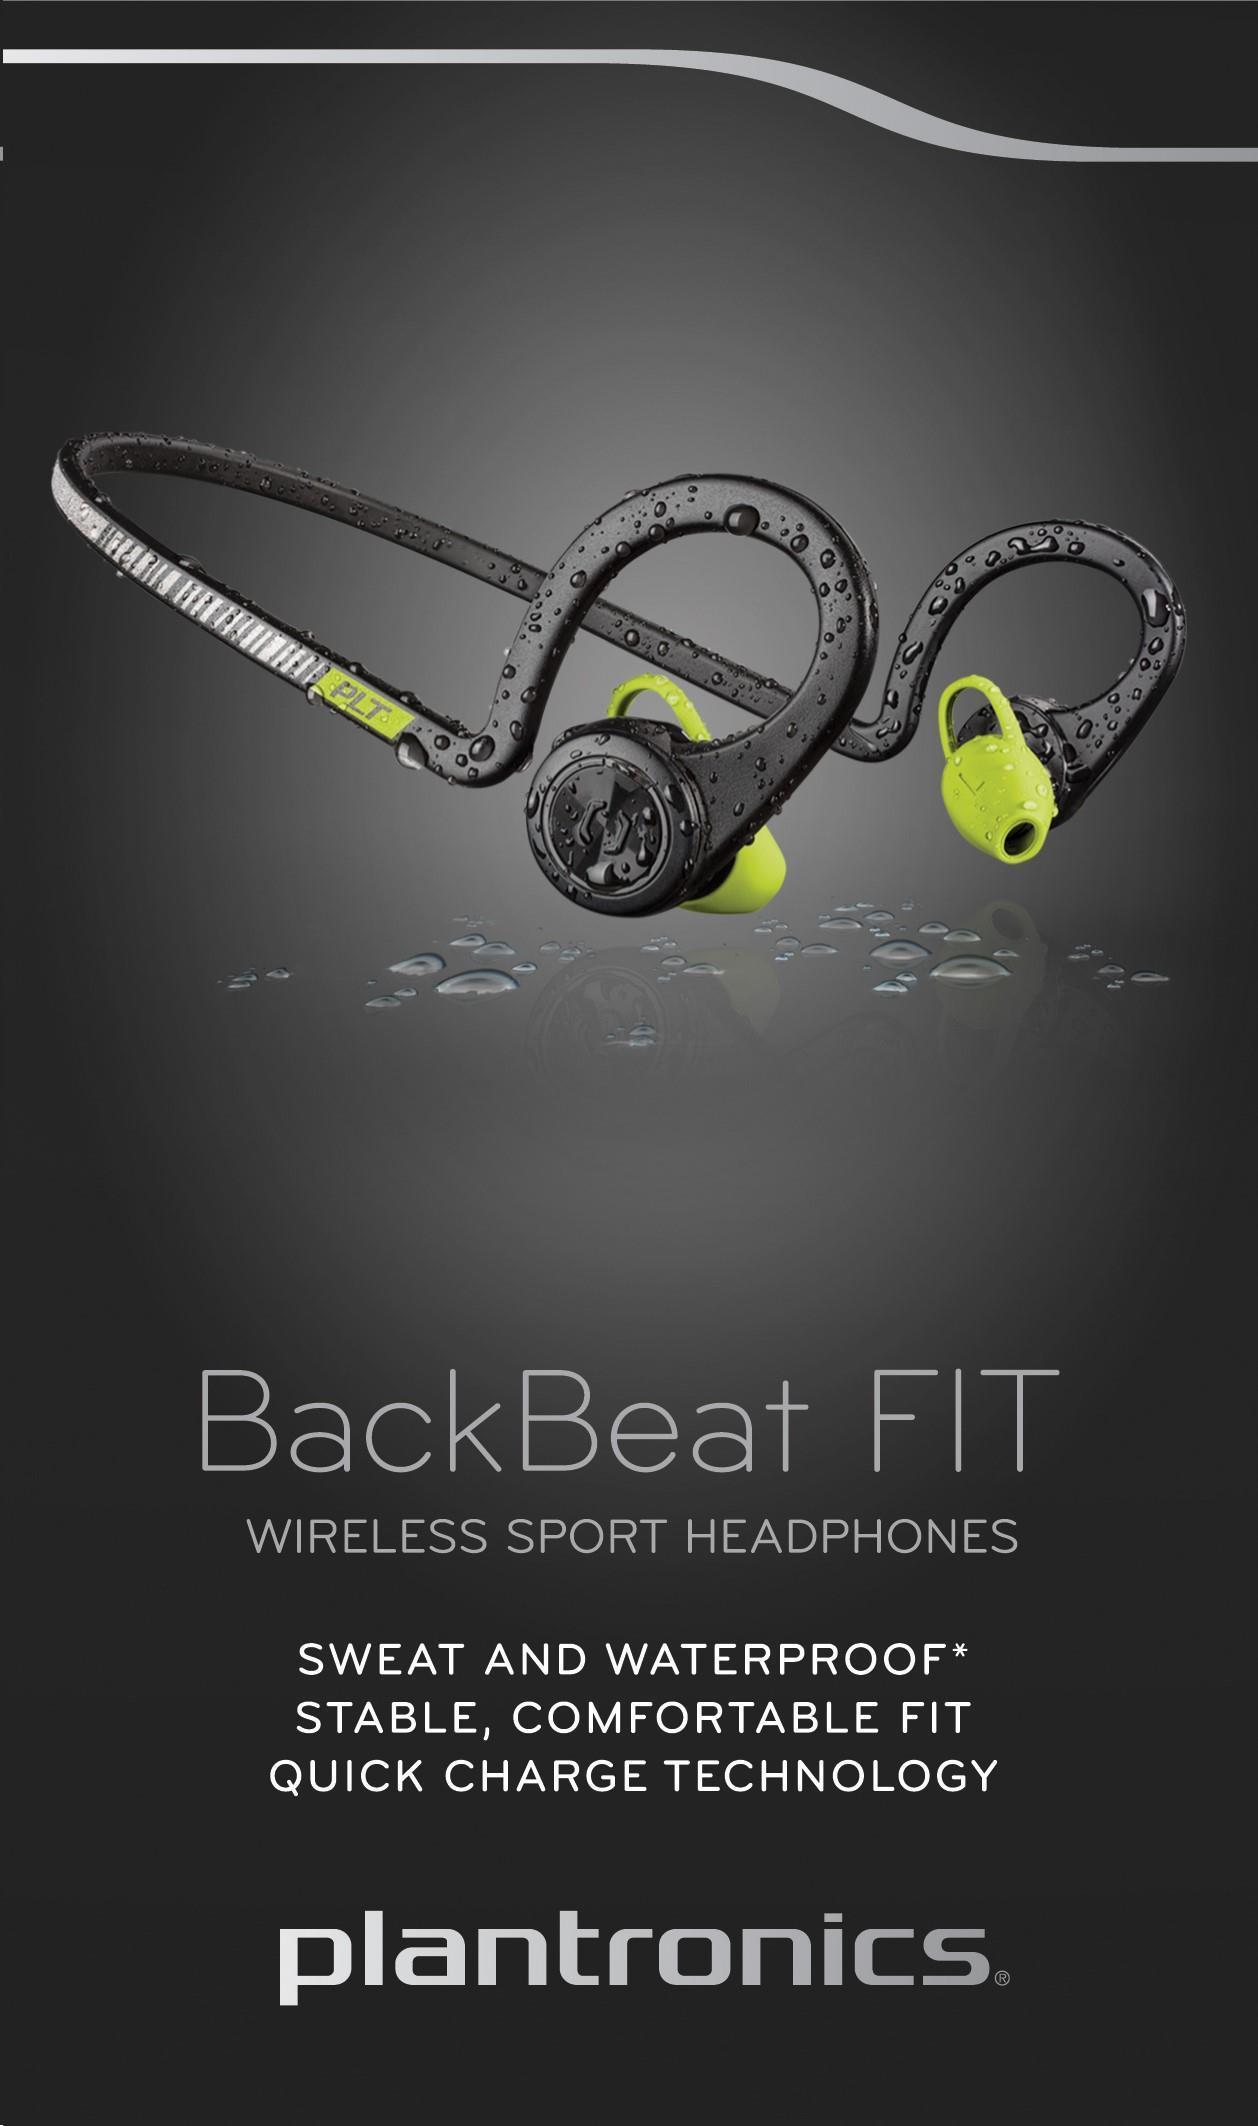 Plantronics Backbeat FIT Stereo Bluetooth Sports Headphones (Black Core)